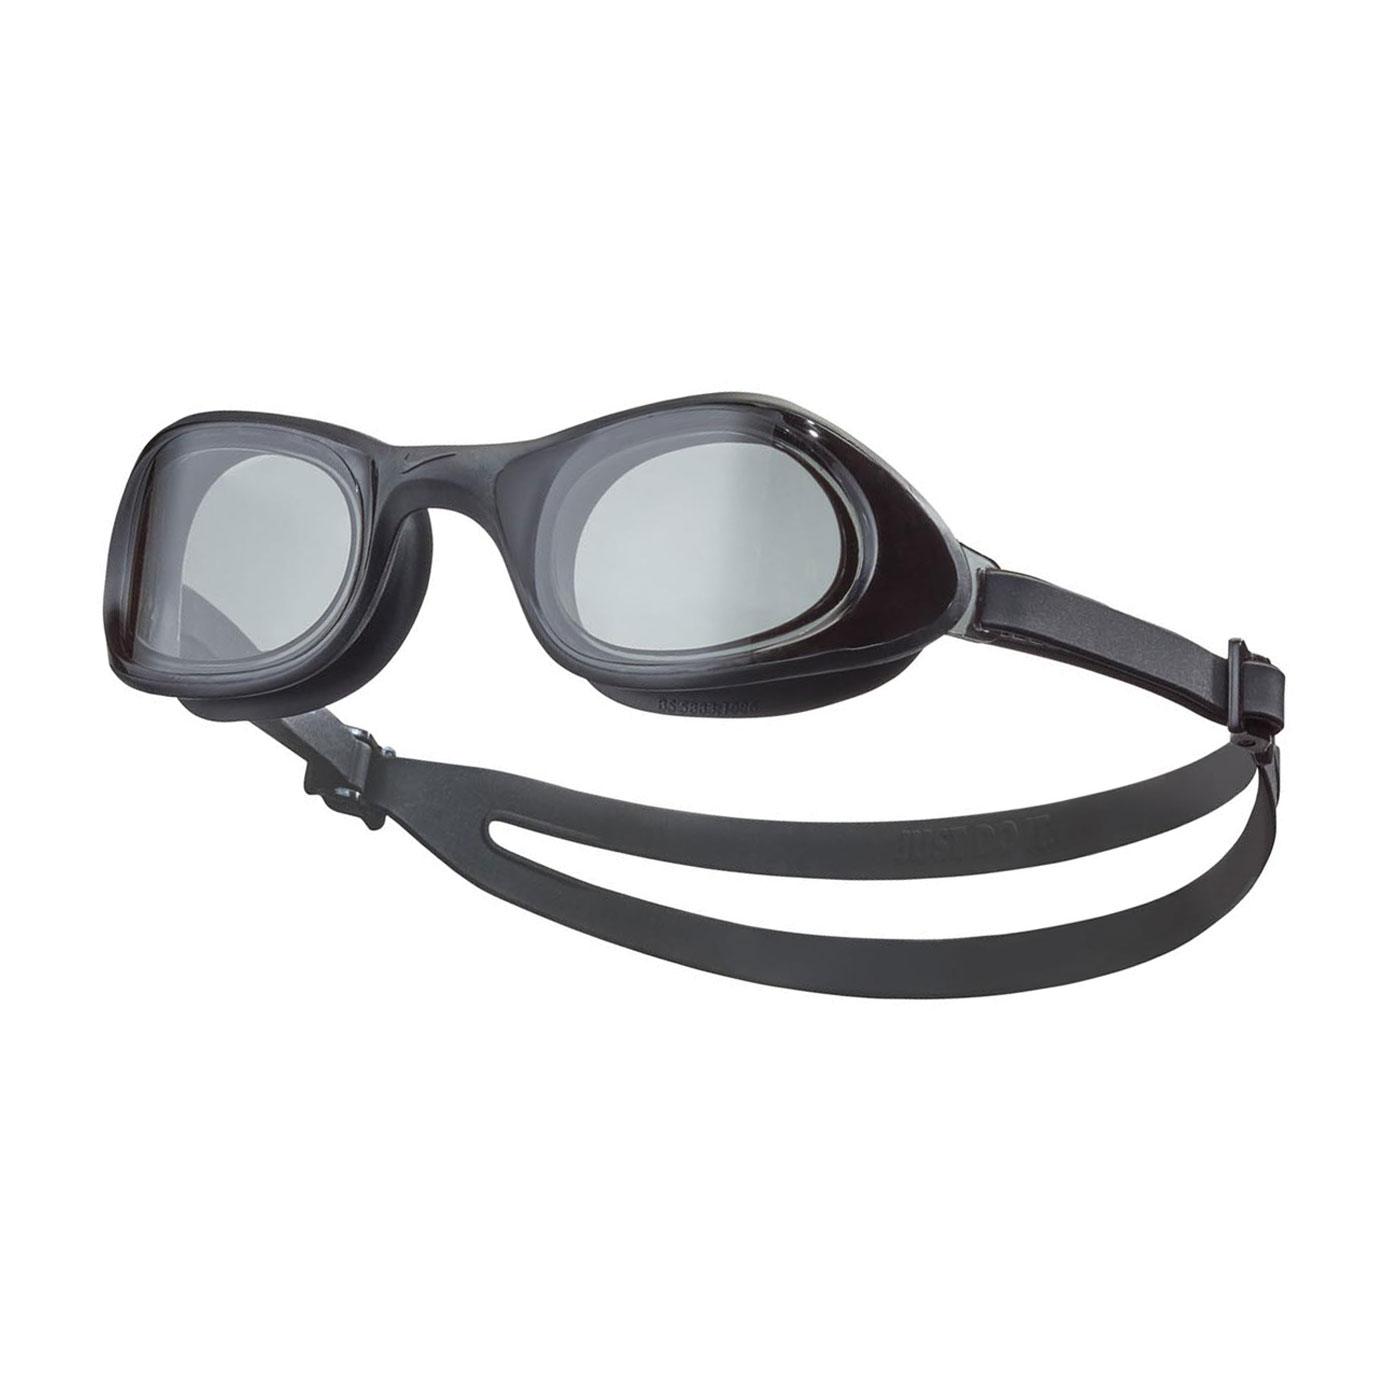 NIKE SWIM 成人超廣角泳鏡 NESSB161-014